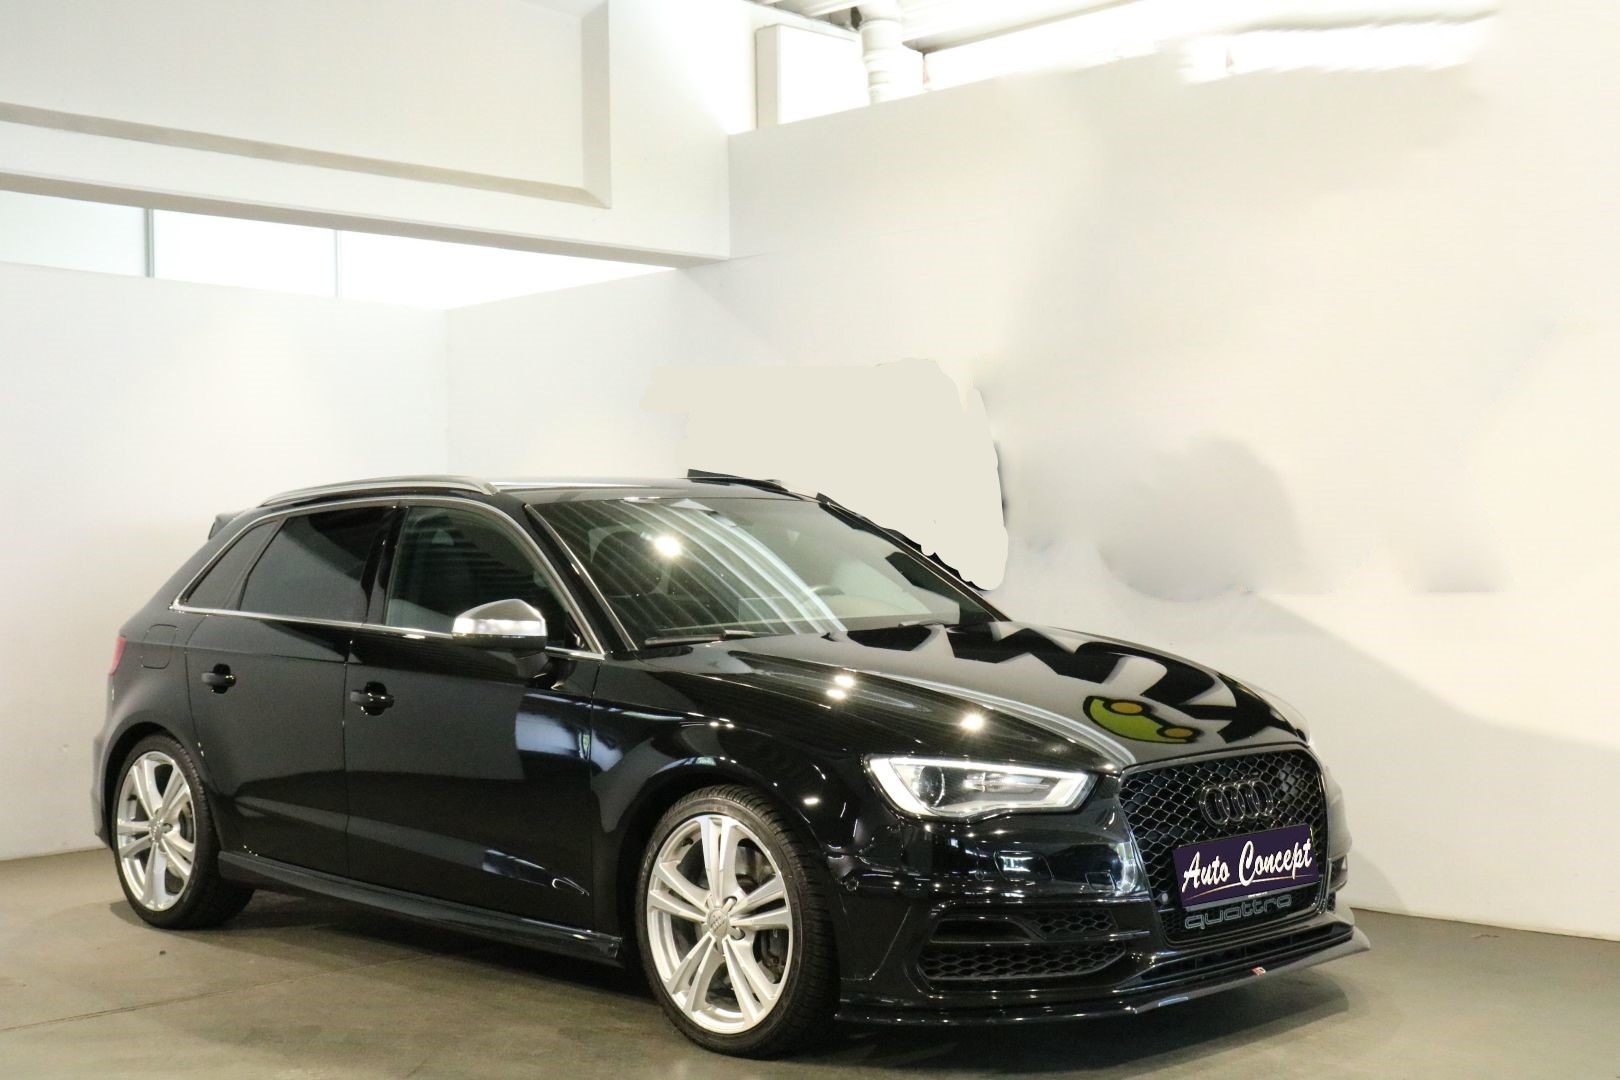 Audi S3 III 2 0 TFSI 300ch quattro S tronic 6